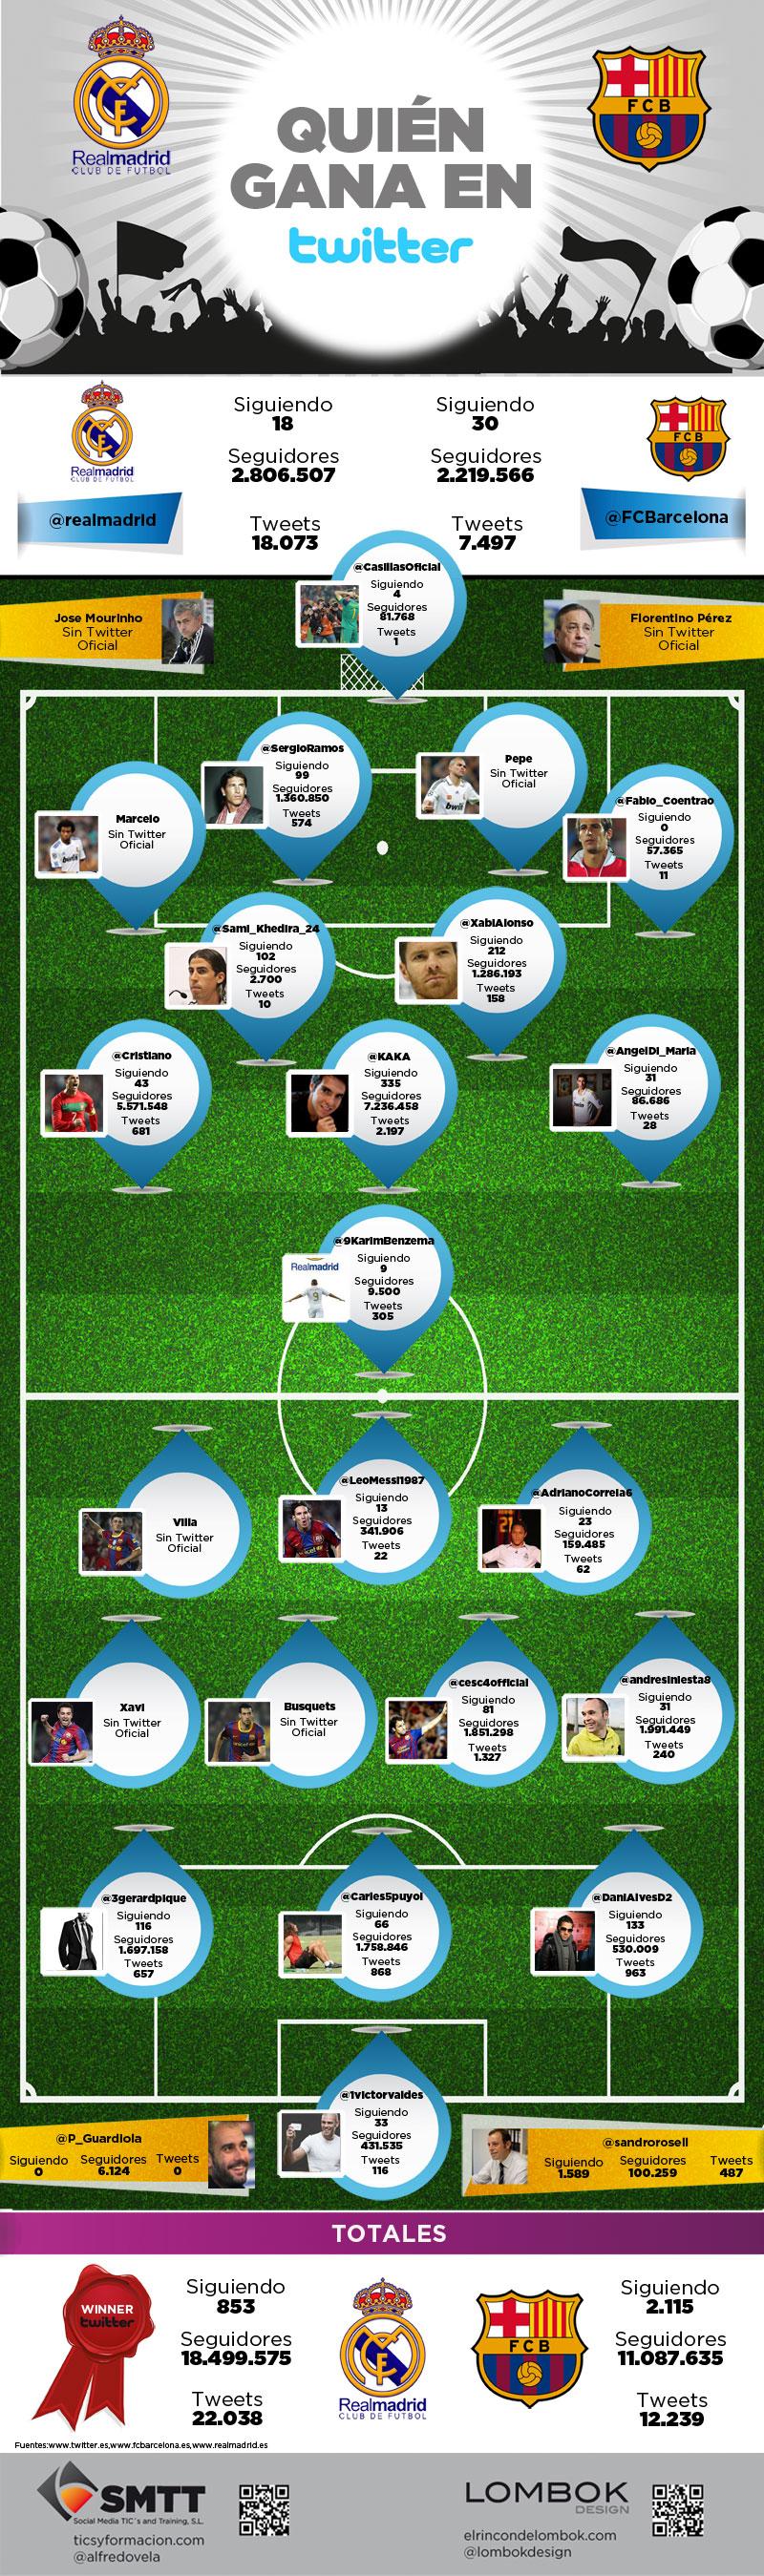 Infografía Clásico Real Madrid vs FC Barcelona en Twitter en Inglés